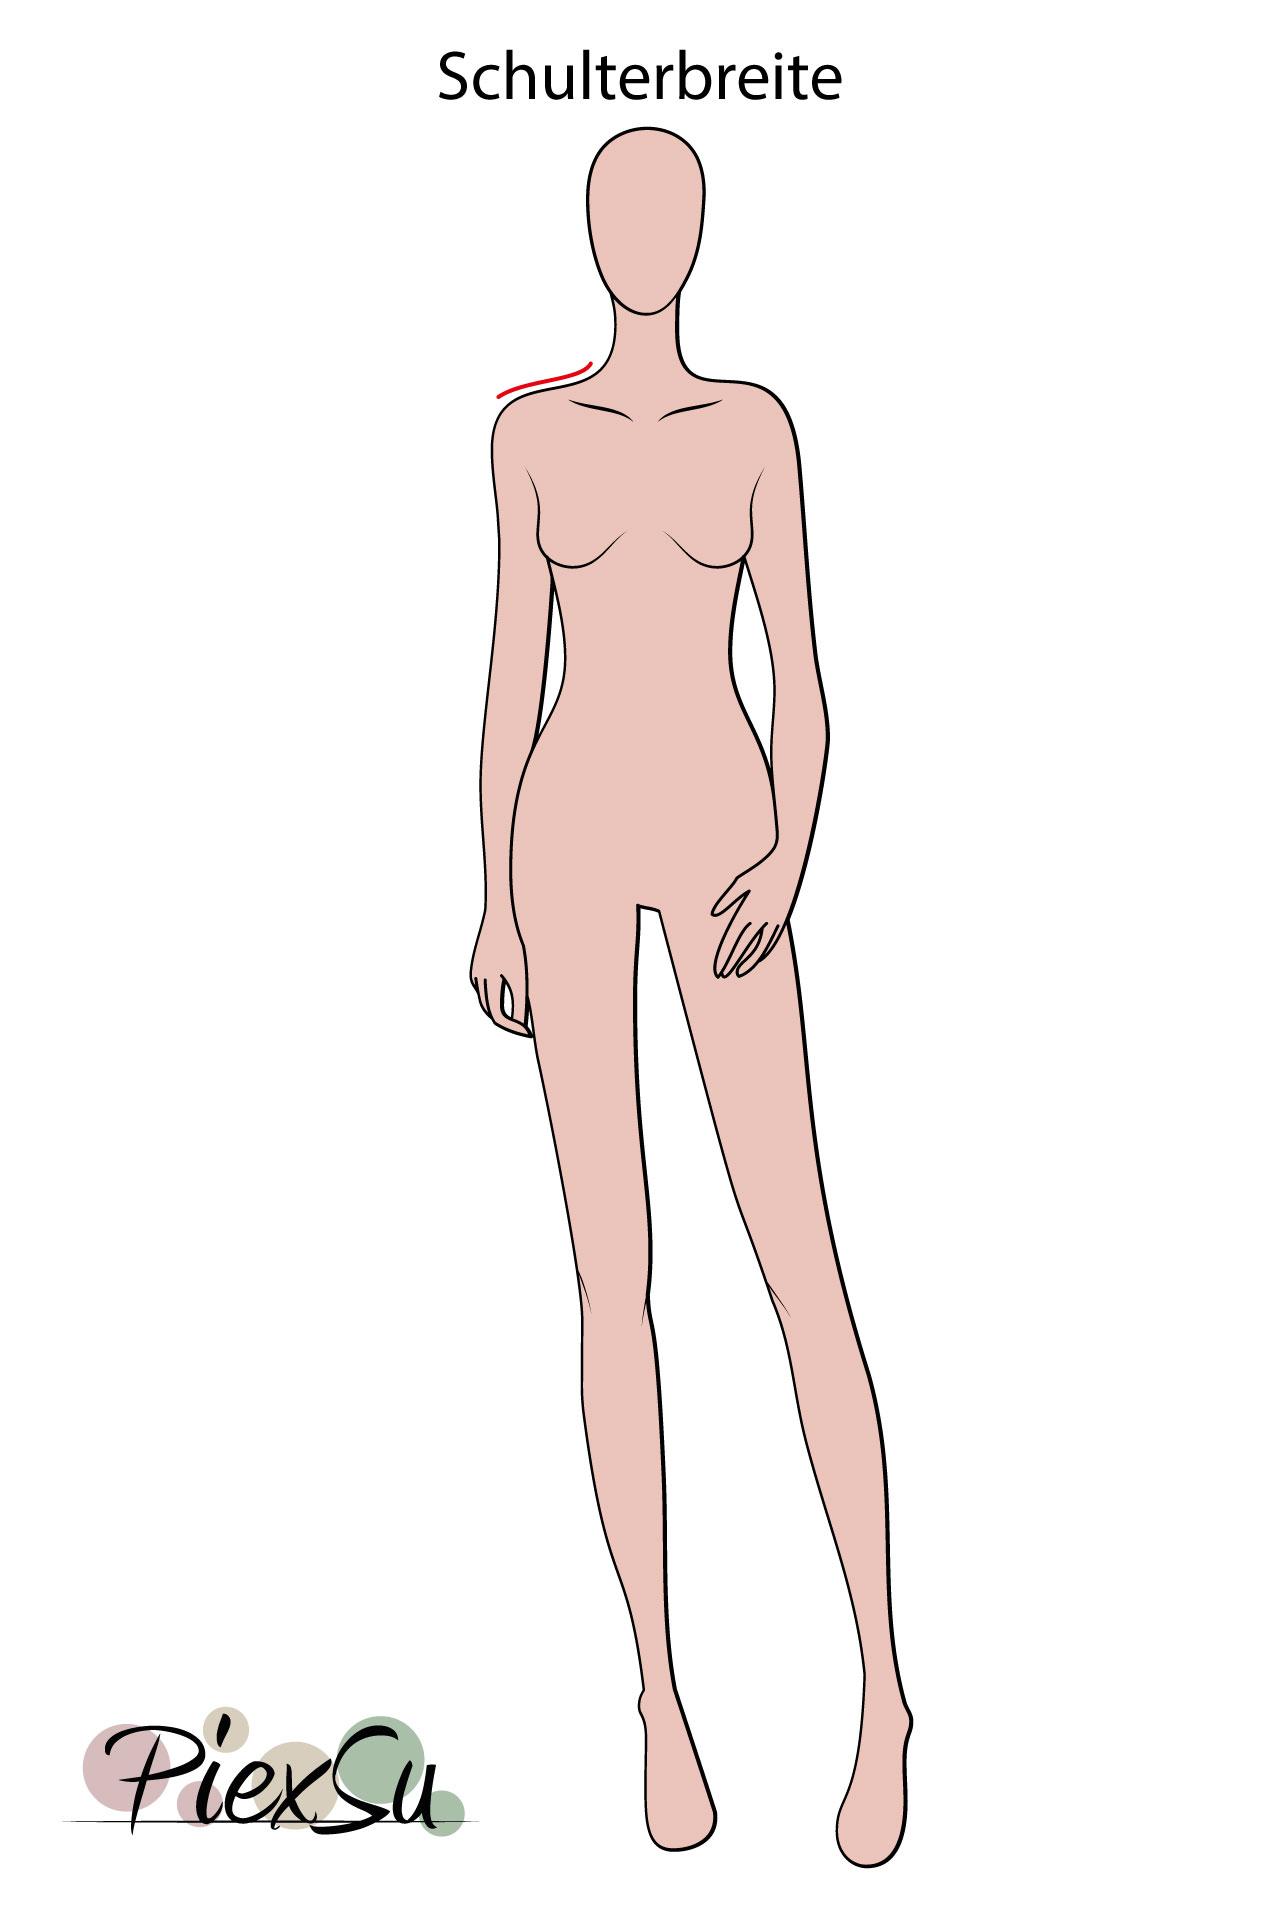 PiexSu-richtig-Maßnehmen-Maße-Schnittmuster-nähen-Schnittmuster-anpassen-messen-Maßband-Schulterbreite